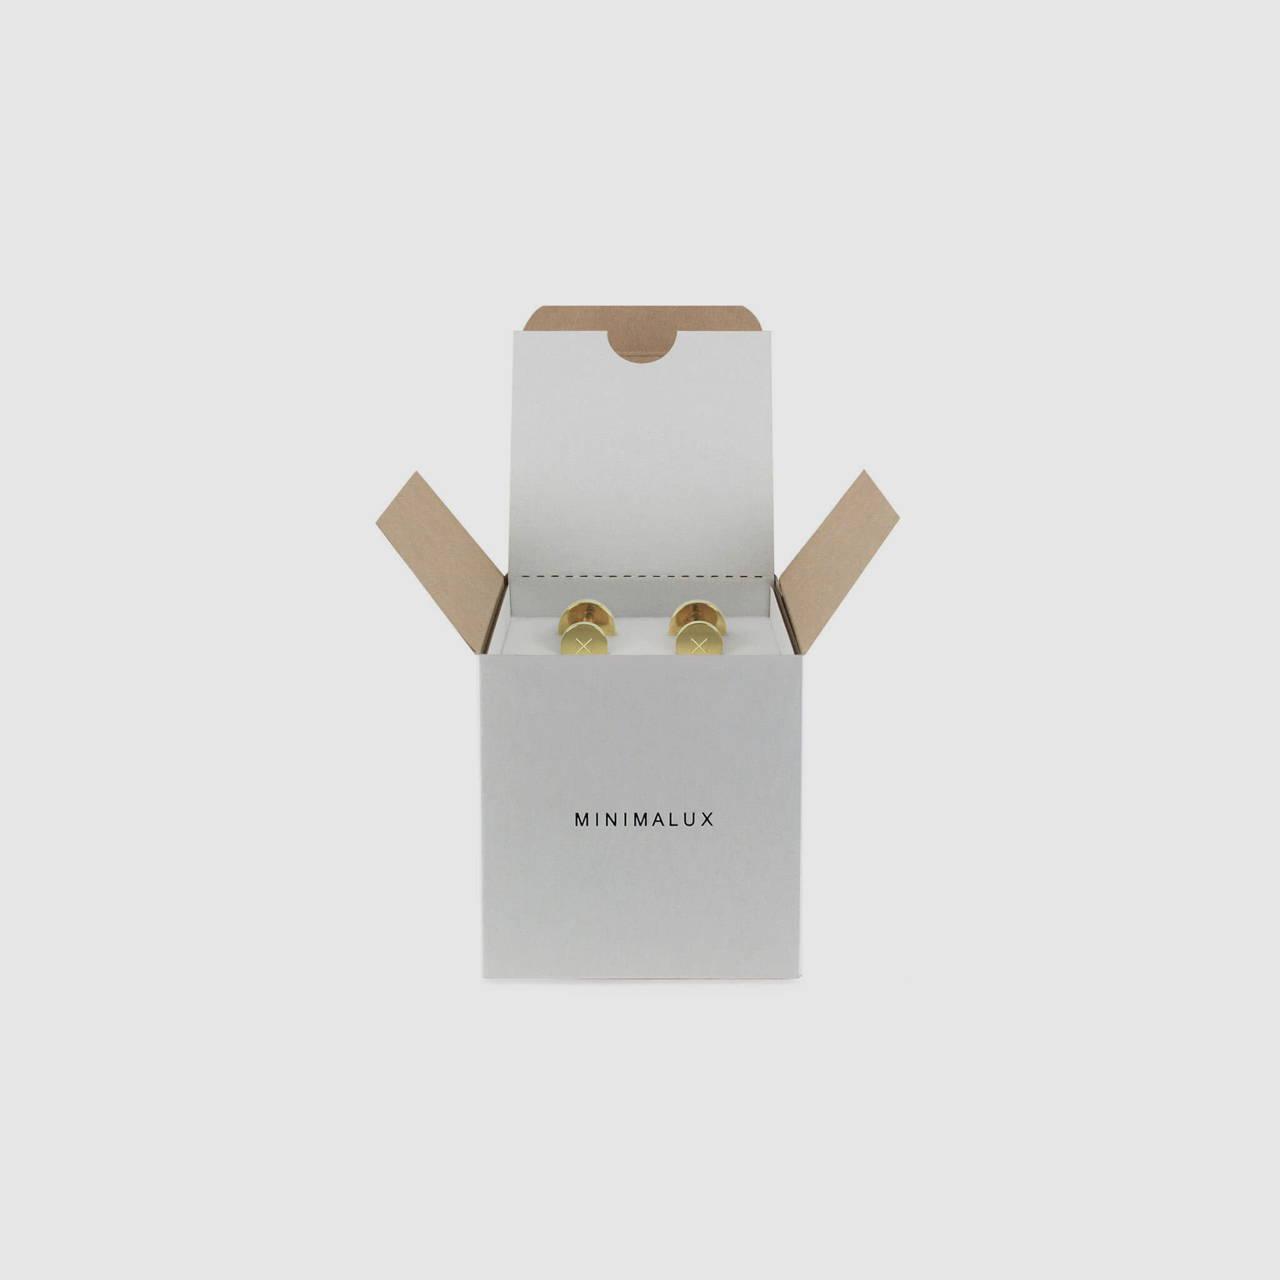 Polished Brass Cufflink packaging